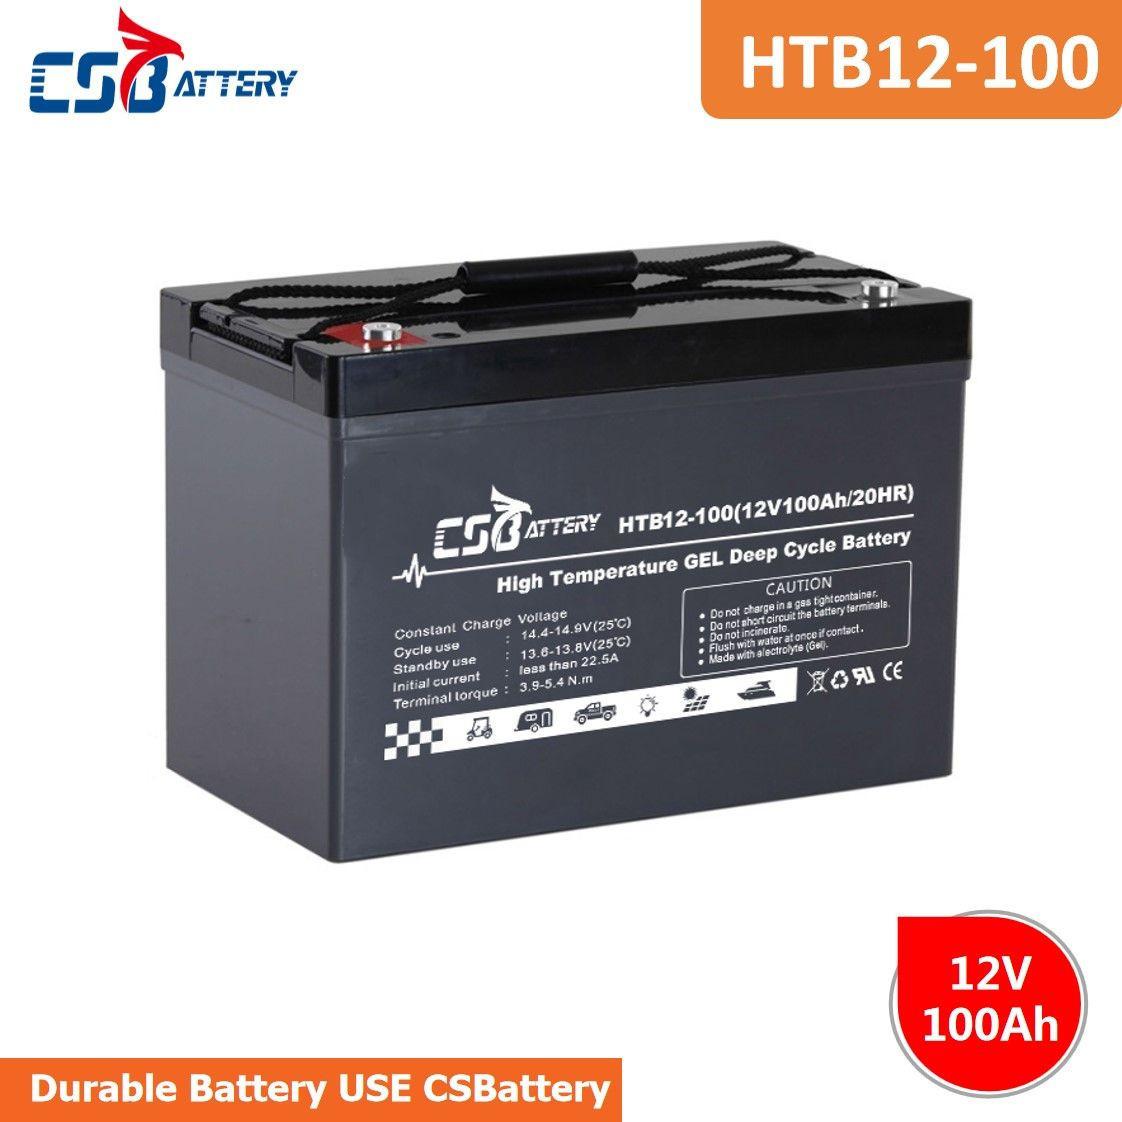 CSBattery 12V High-Temp Long Life GEL Deep Cycle Battery for Solar UPS HTB12-100